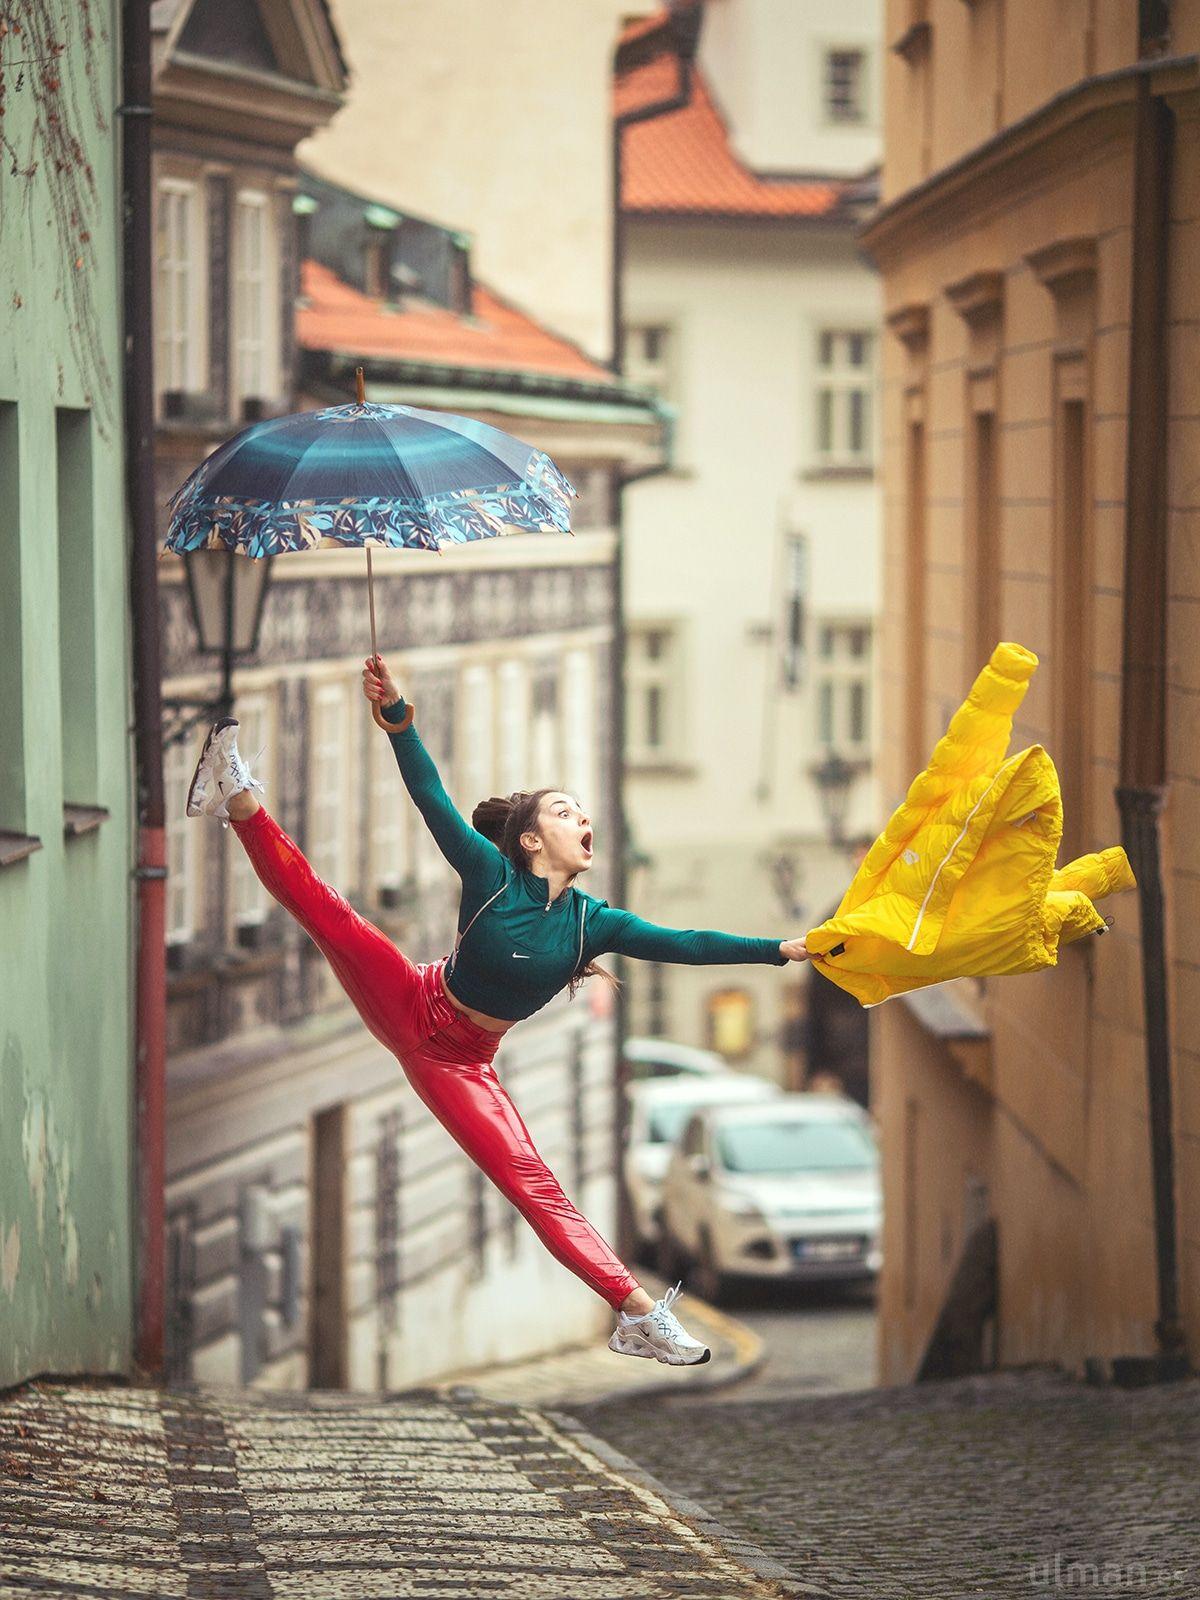 street photography walk down lane by anna ulman